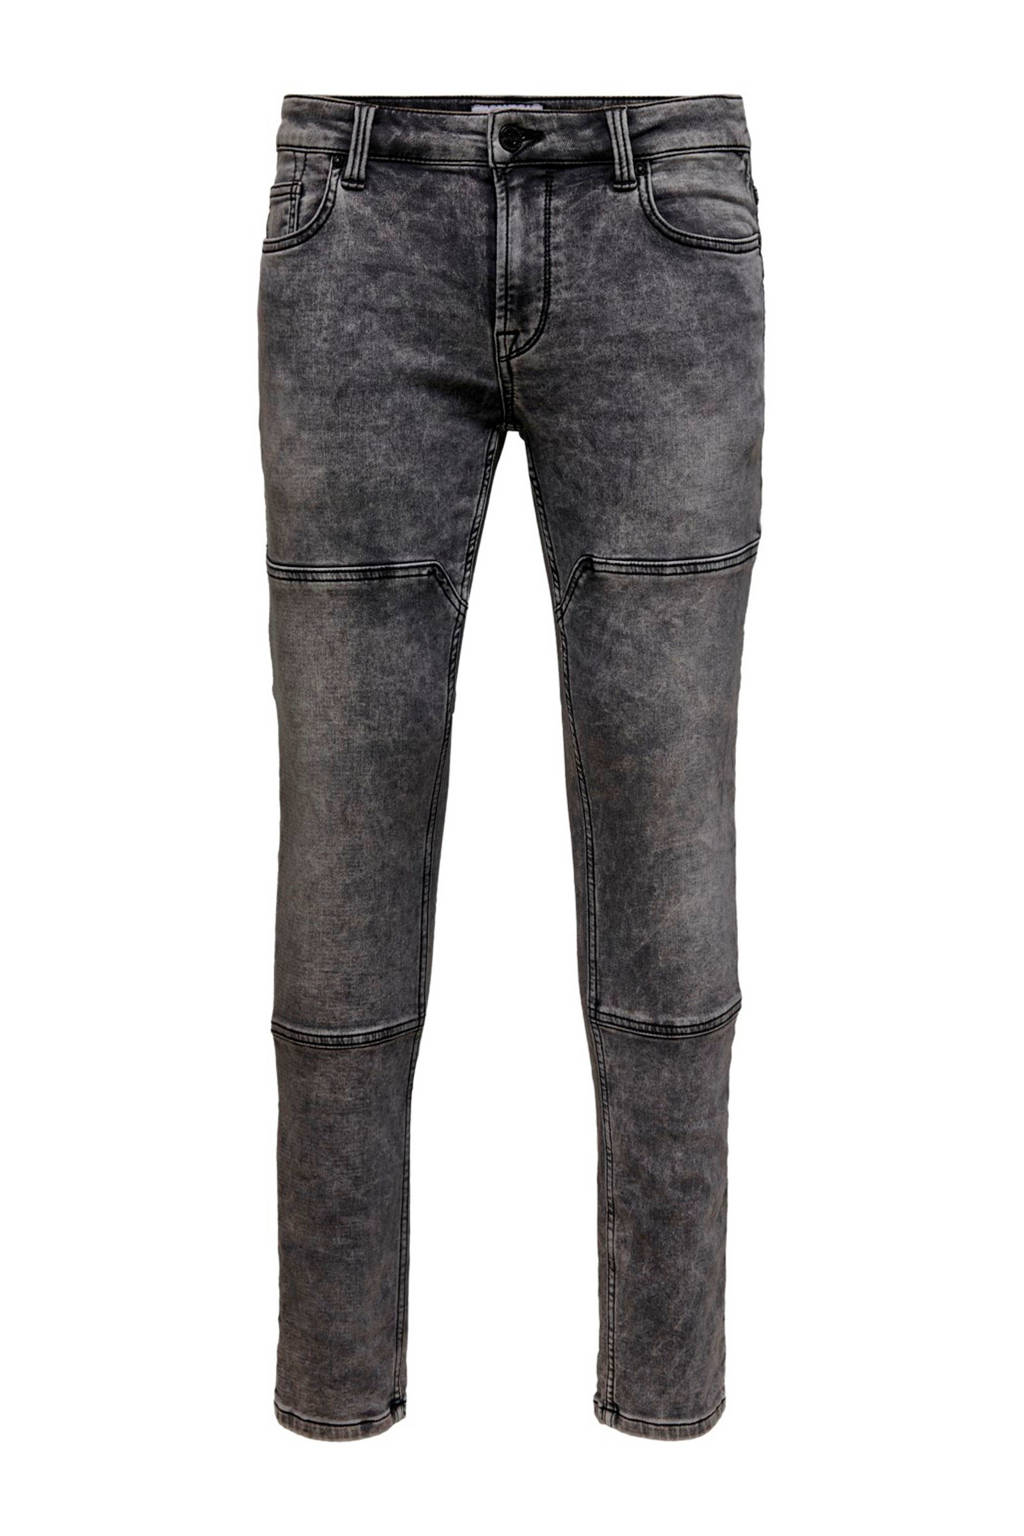 ONLY & SONS slim fit jeans Loom grey denim, Grijs